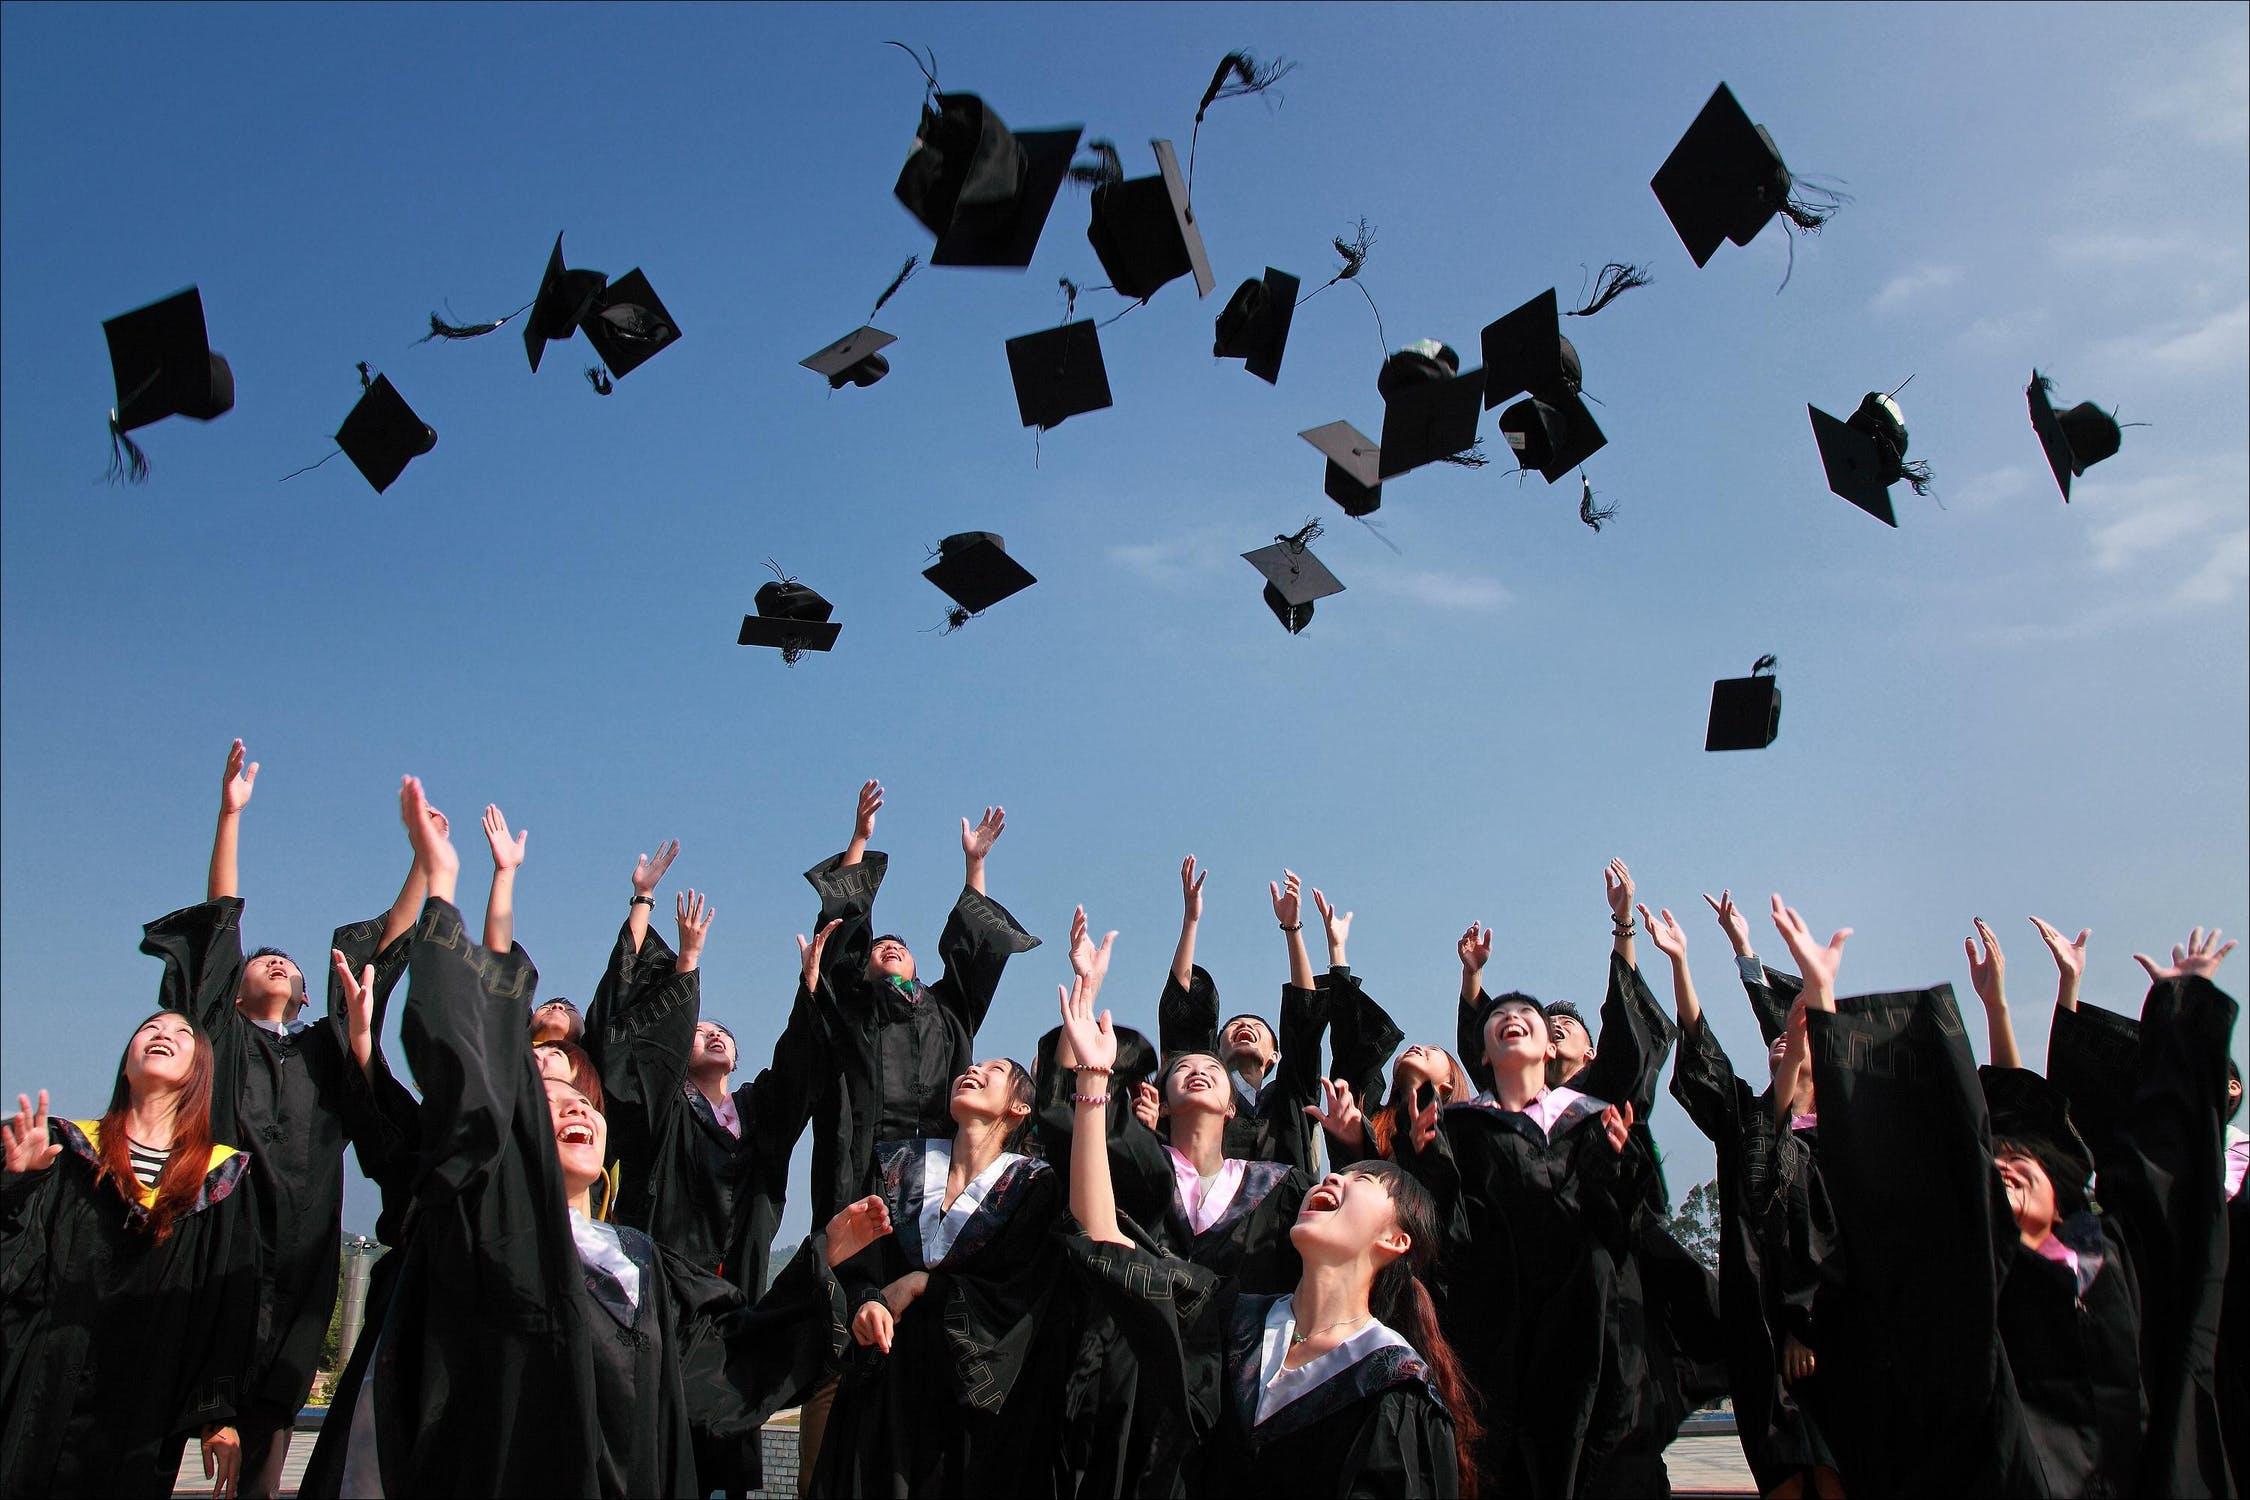 image of a graduation cap toss